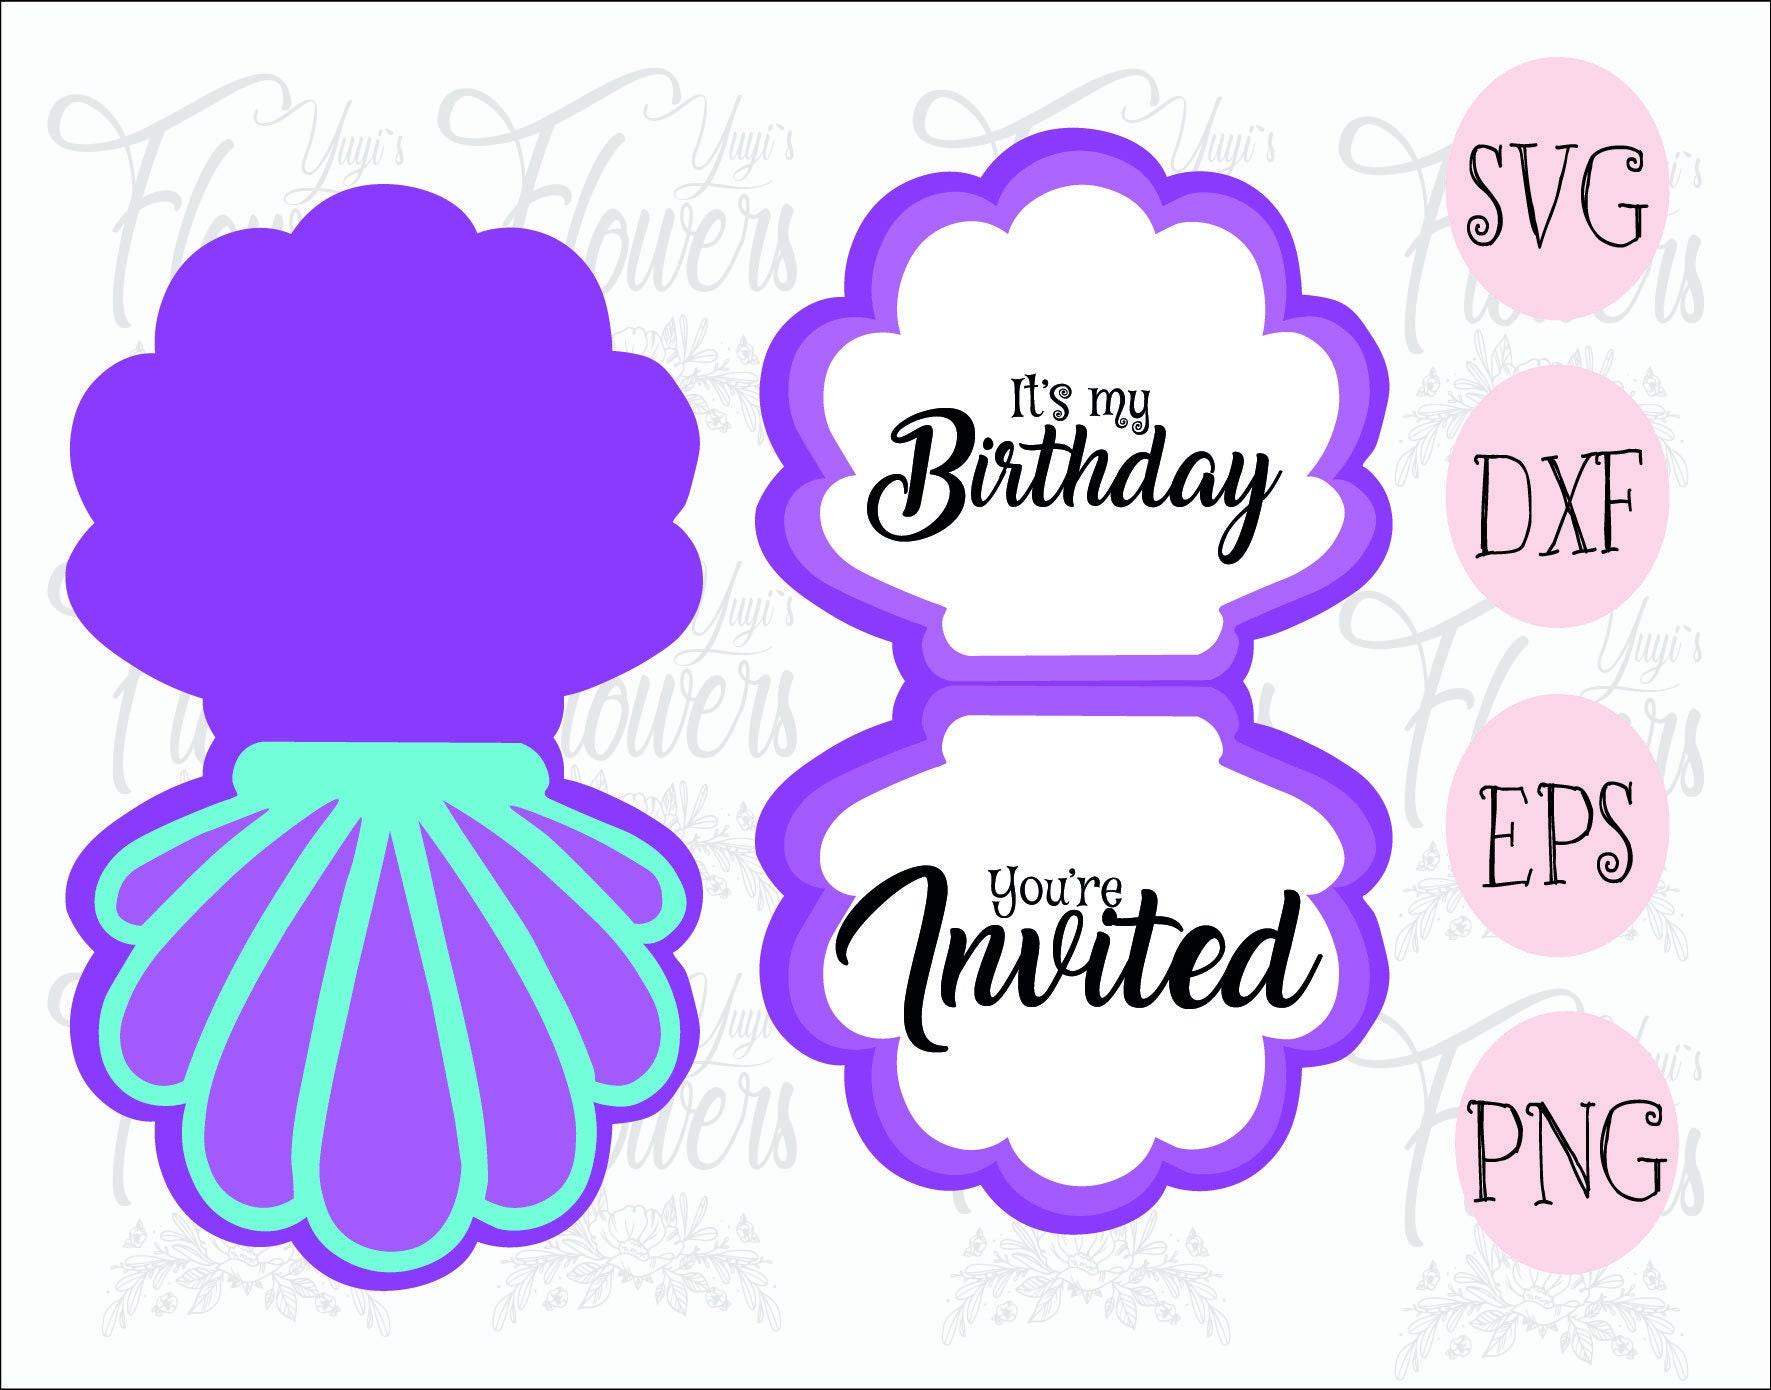 seashell card invitation svg     mermaid party invitation